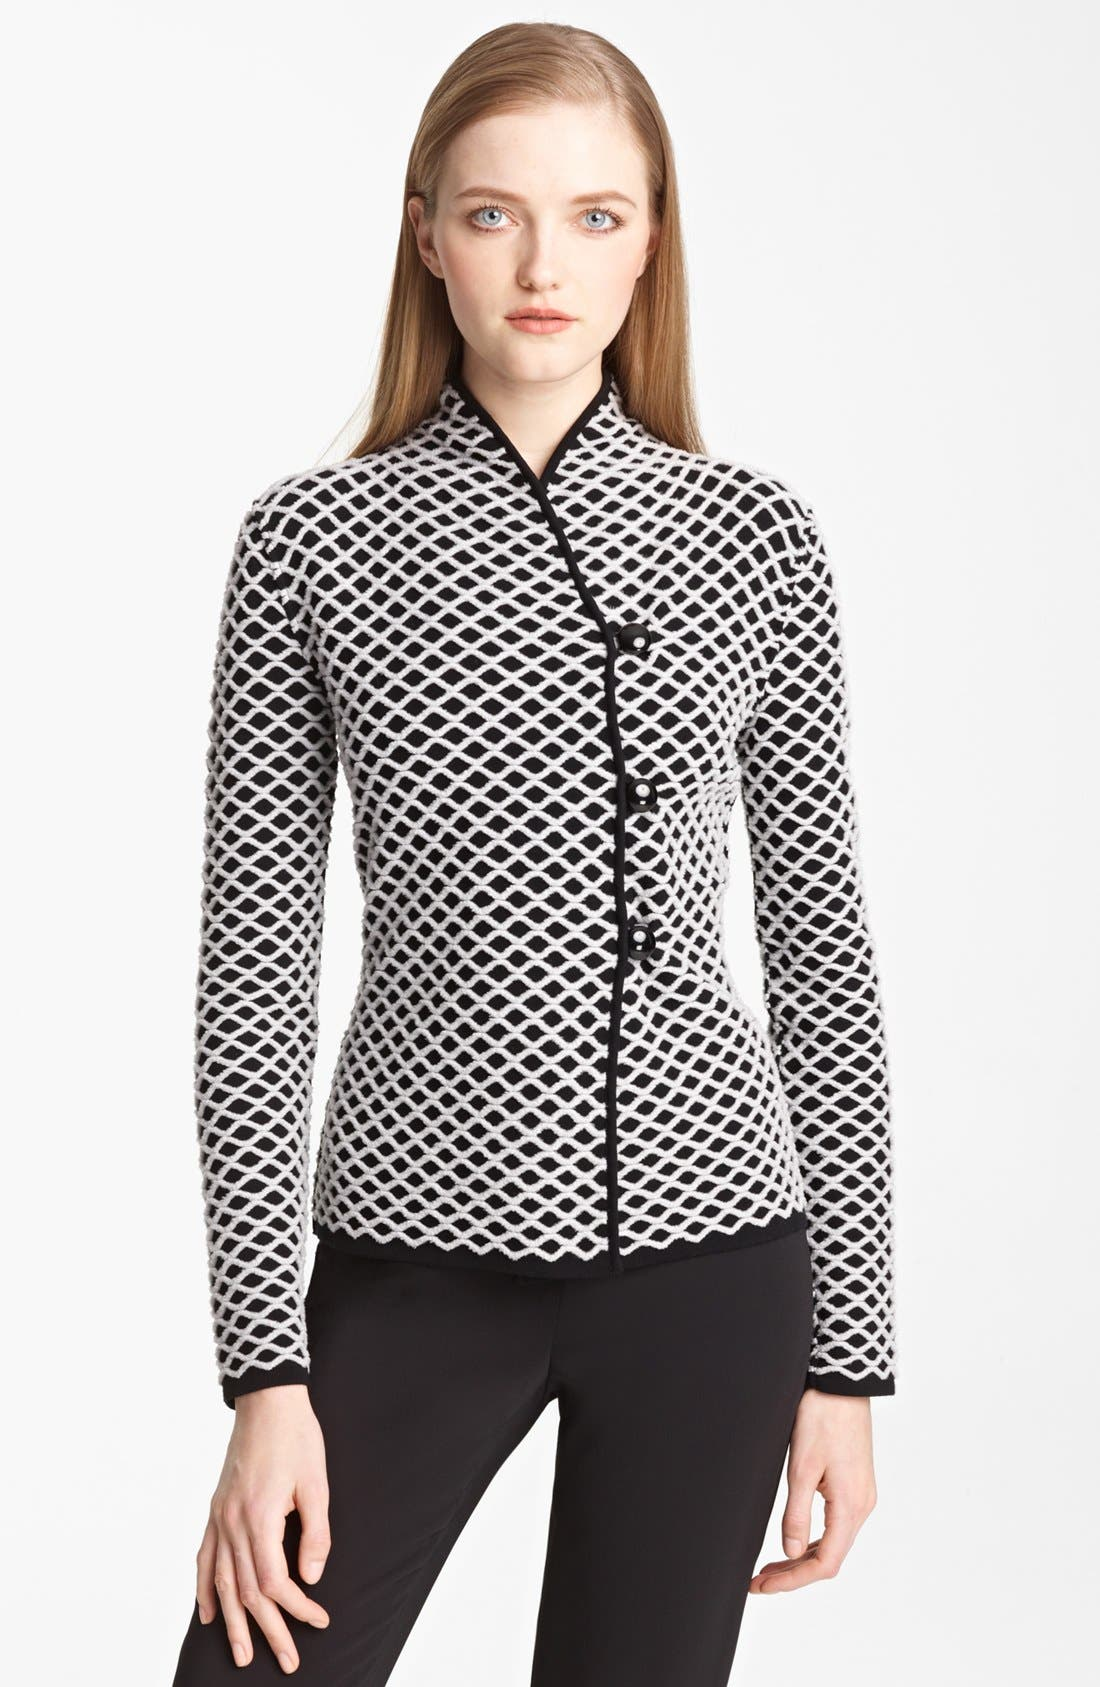 Main Image - Armani Collezioni Basket Weave Sweater Jacket